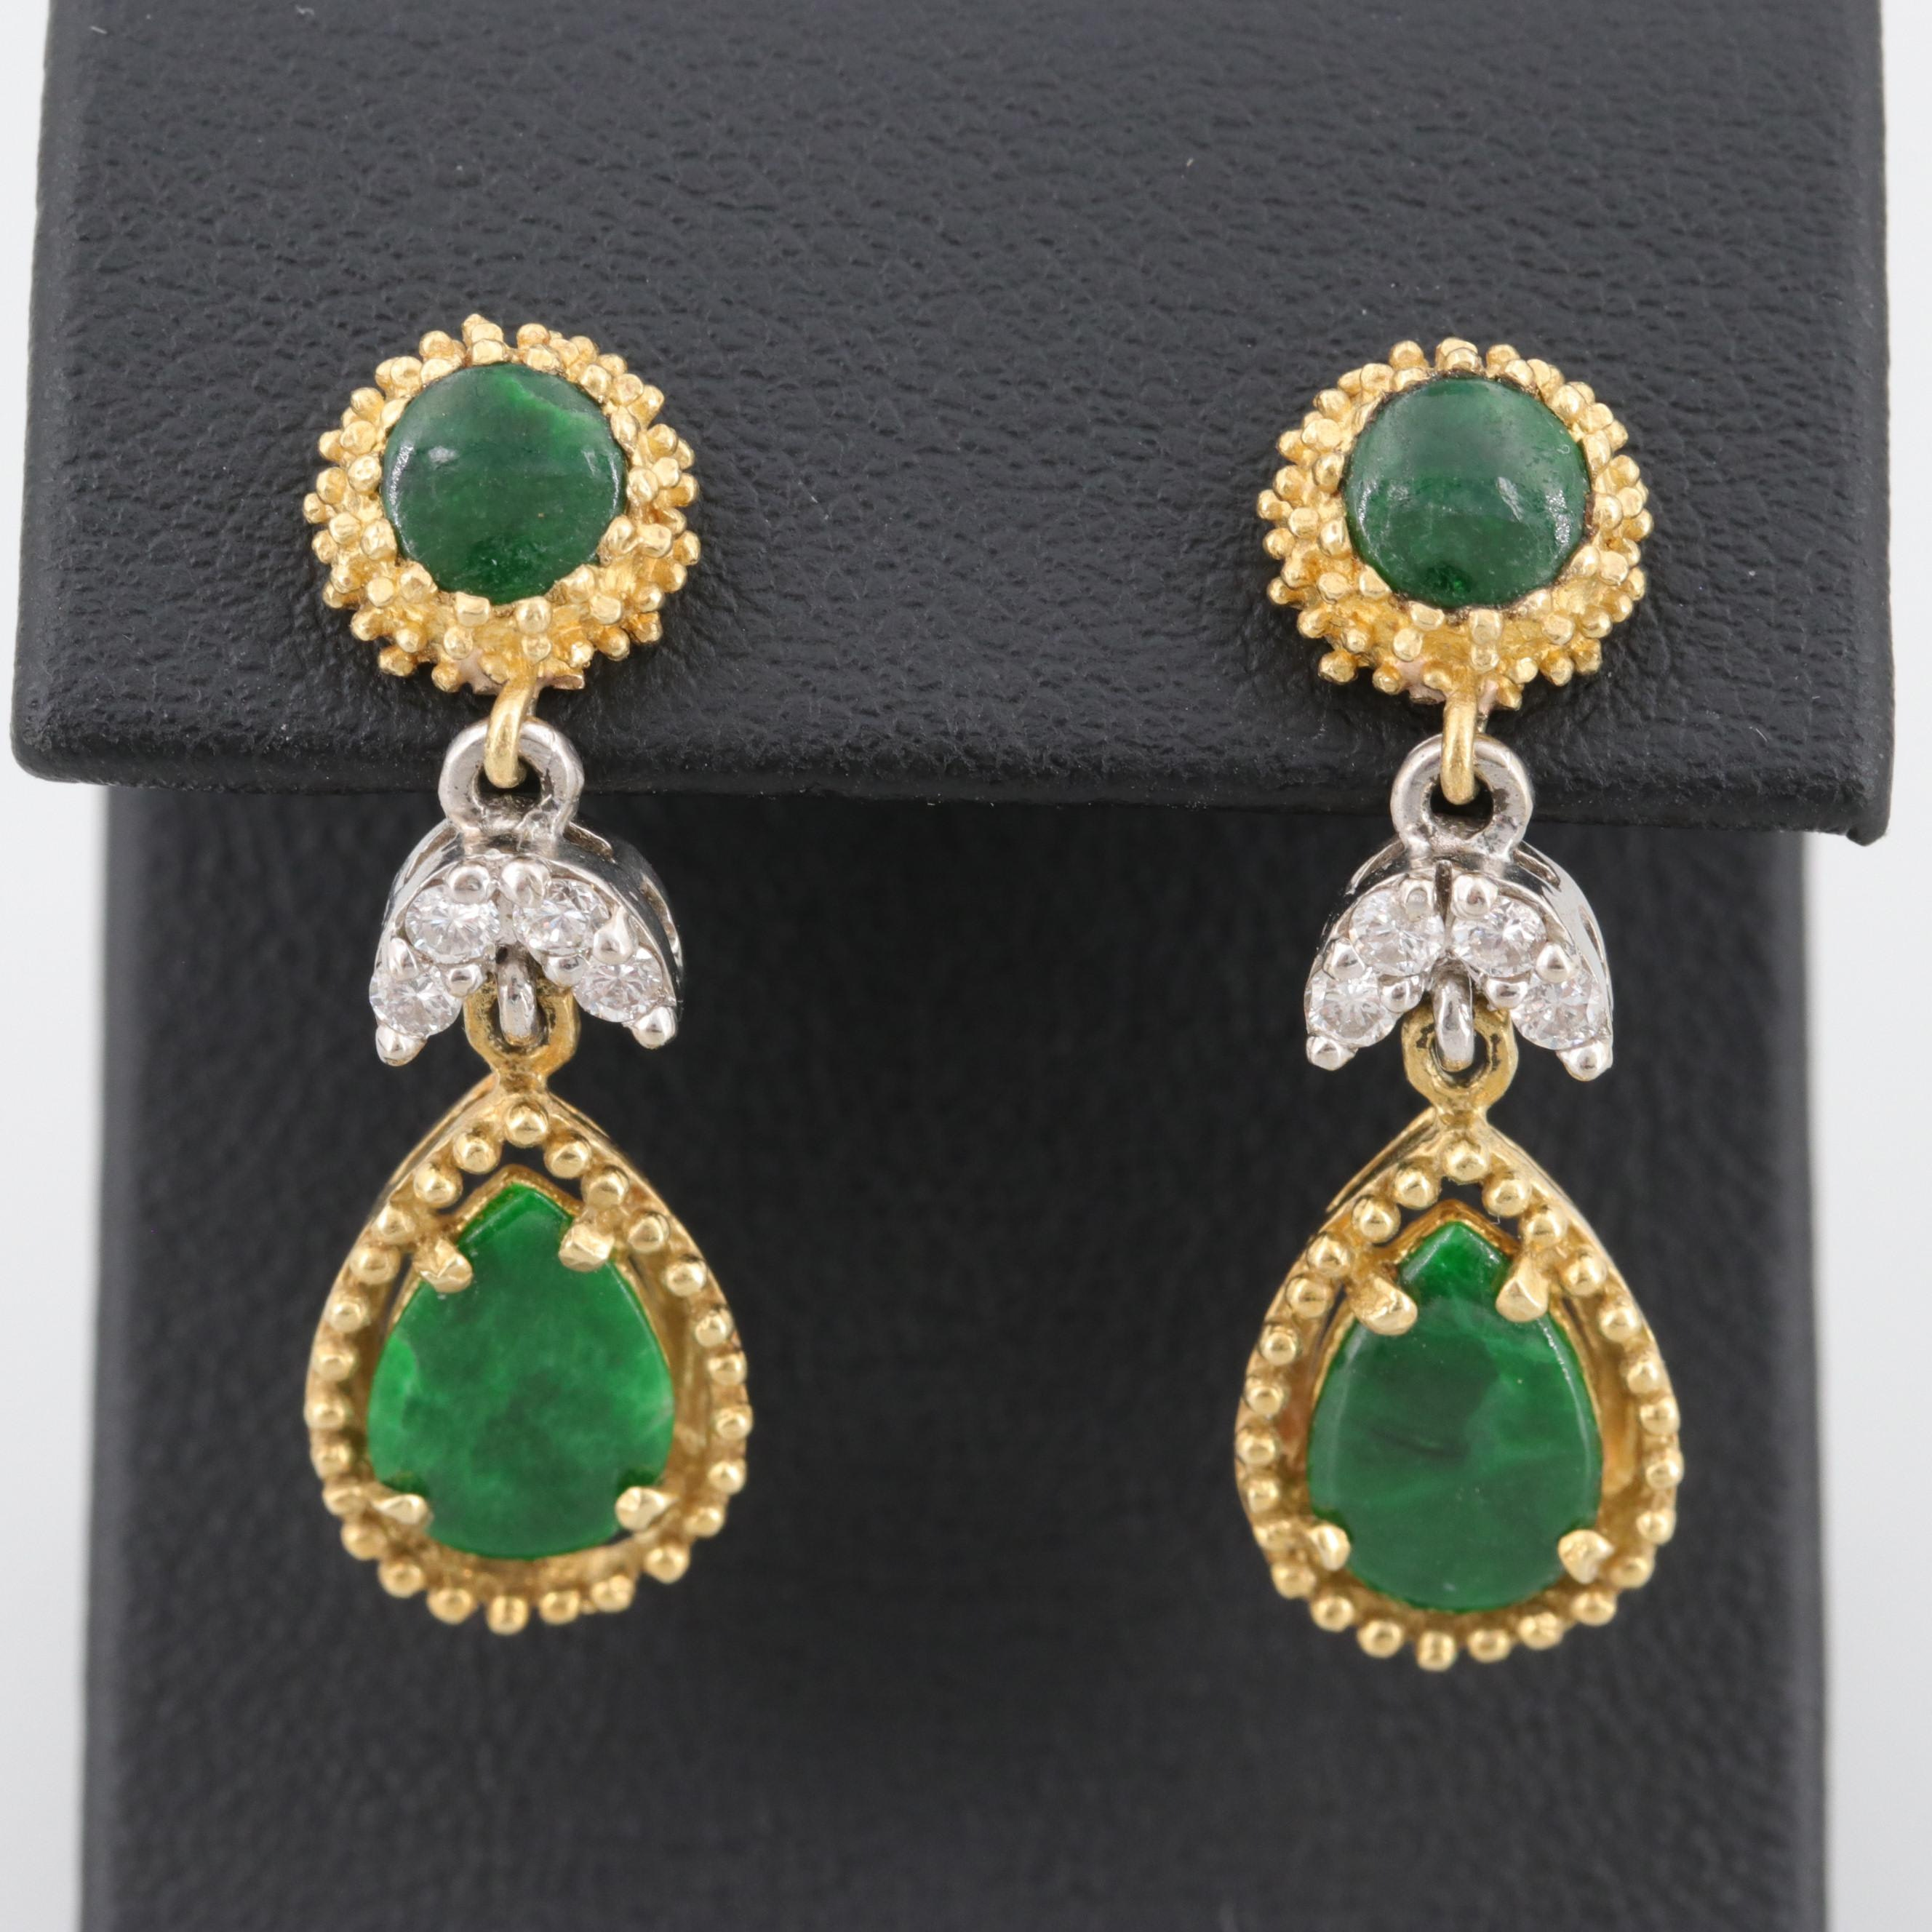 La Triomphe 18K Yellow Gold Jadeite and Diamond Earrings